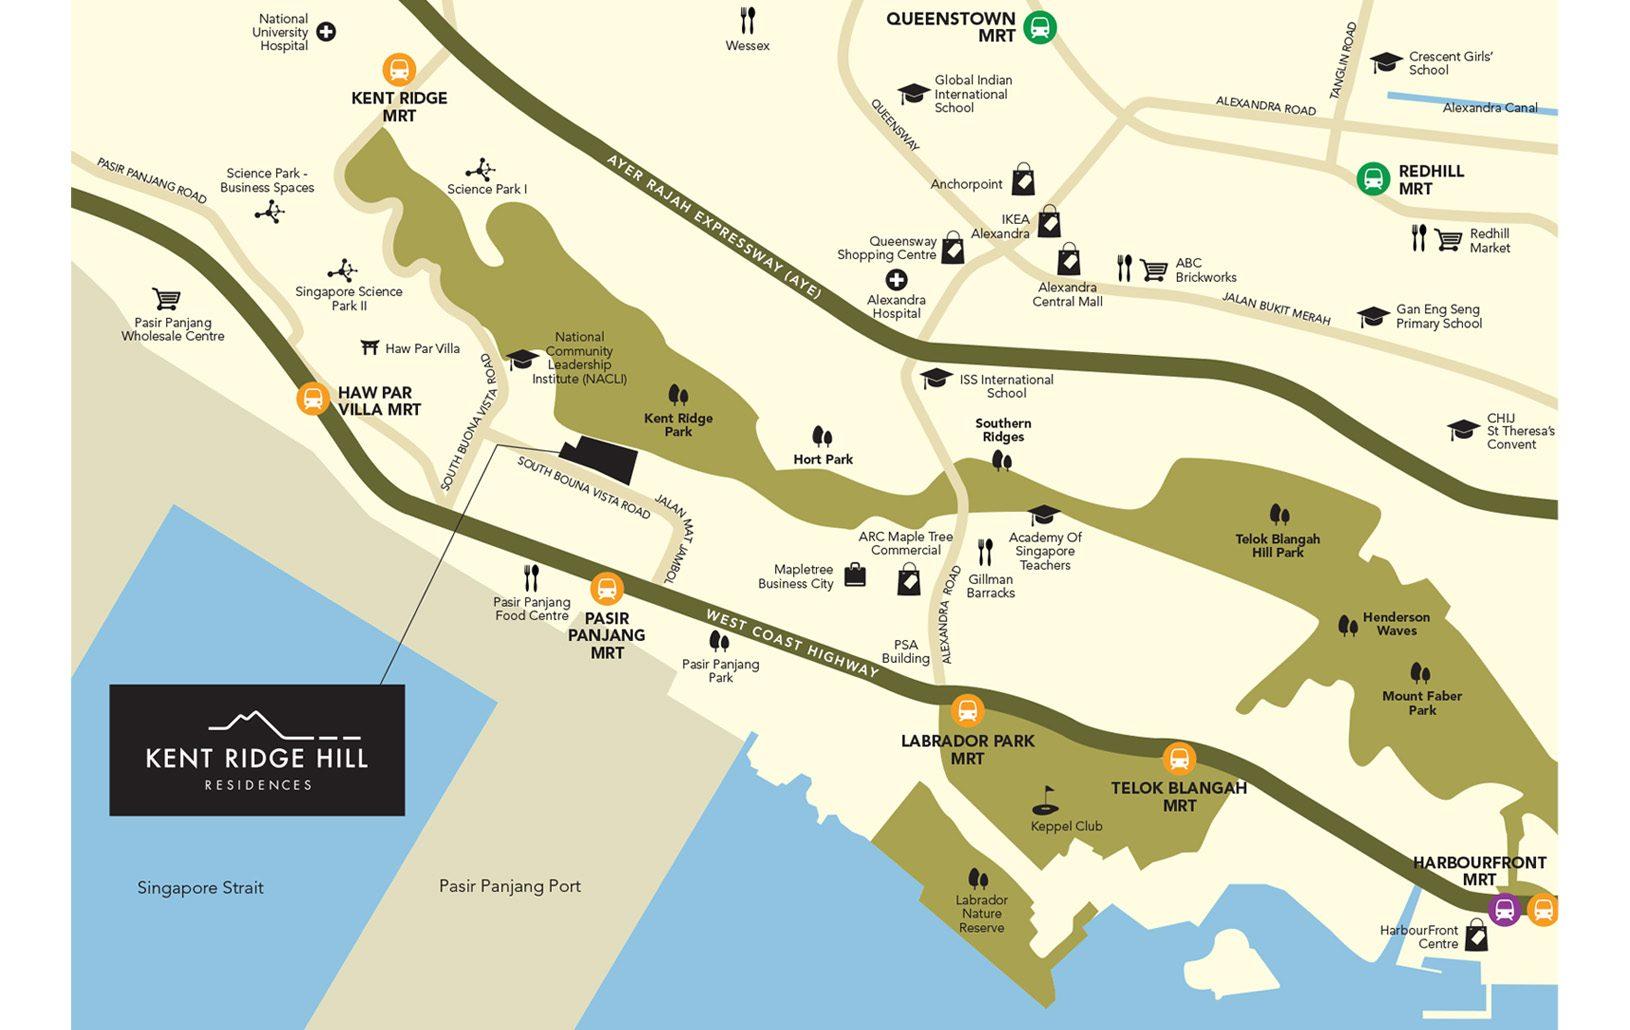 Kent Ridge Hill Residences Location Map - Singapore